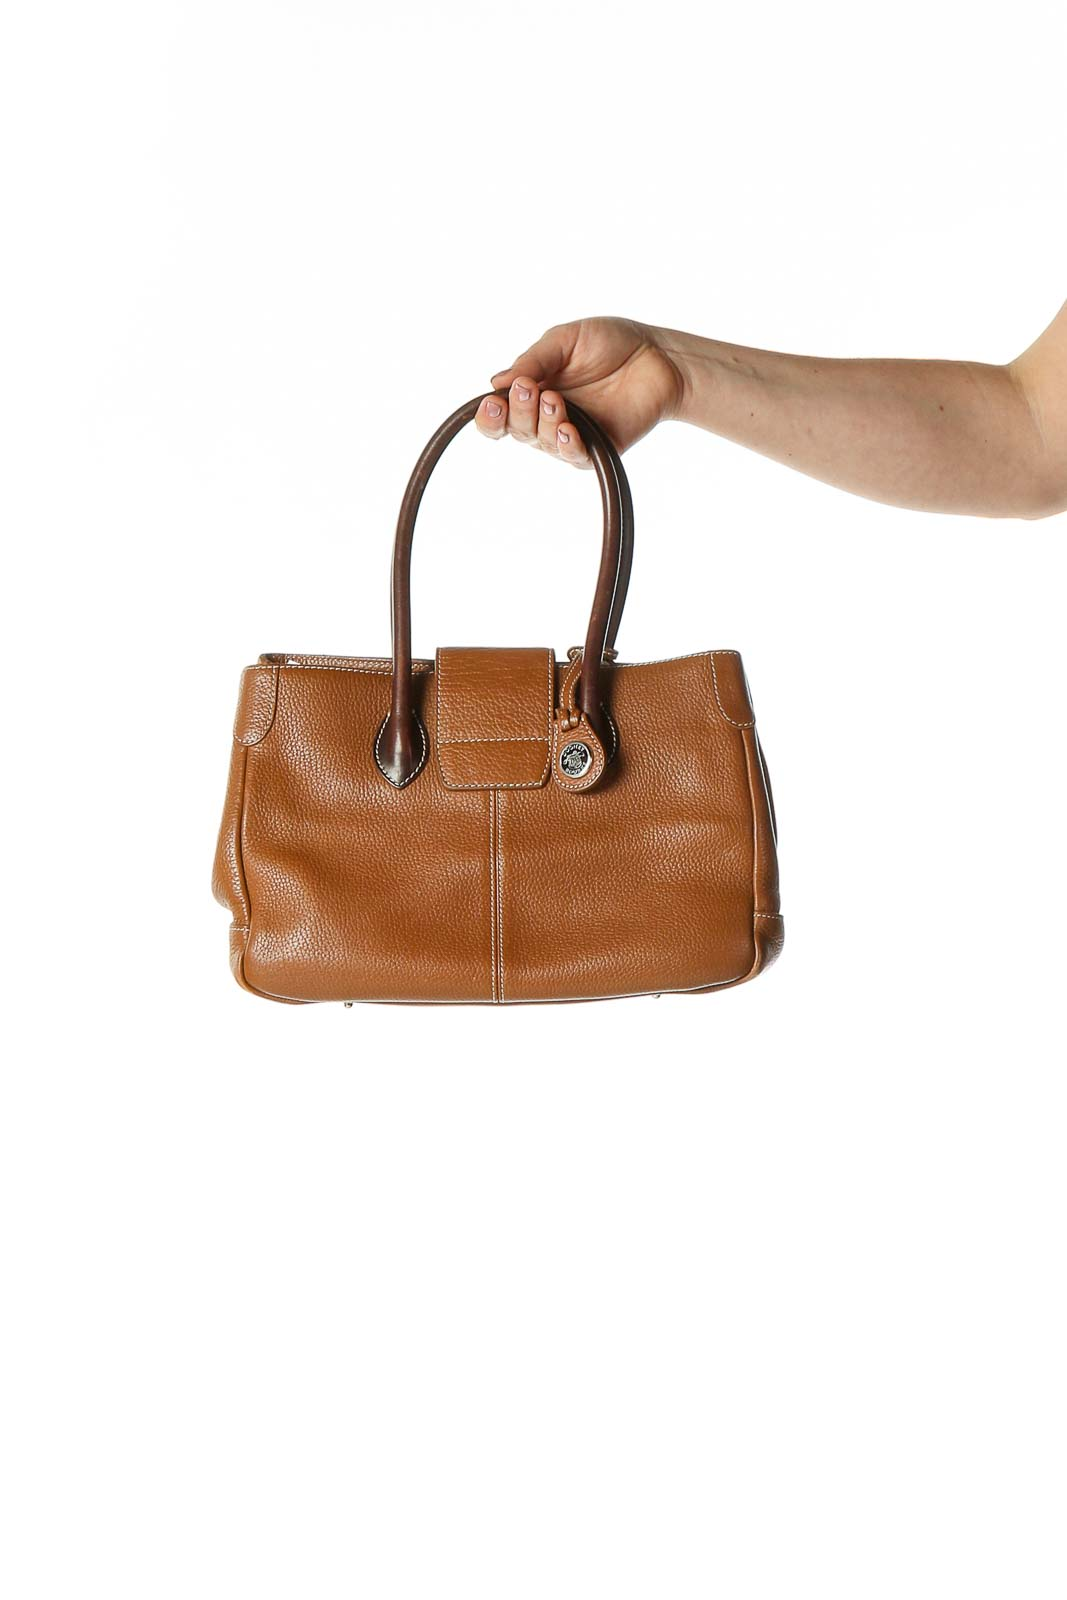 Brown Handbag Front